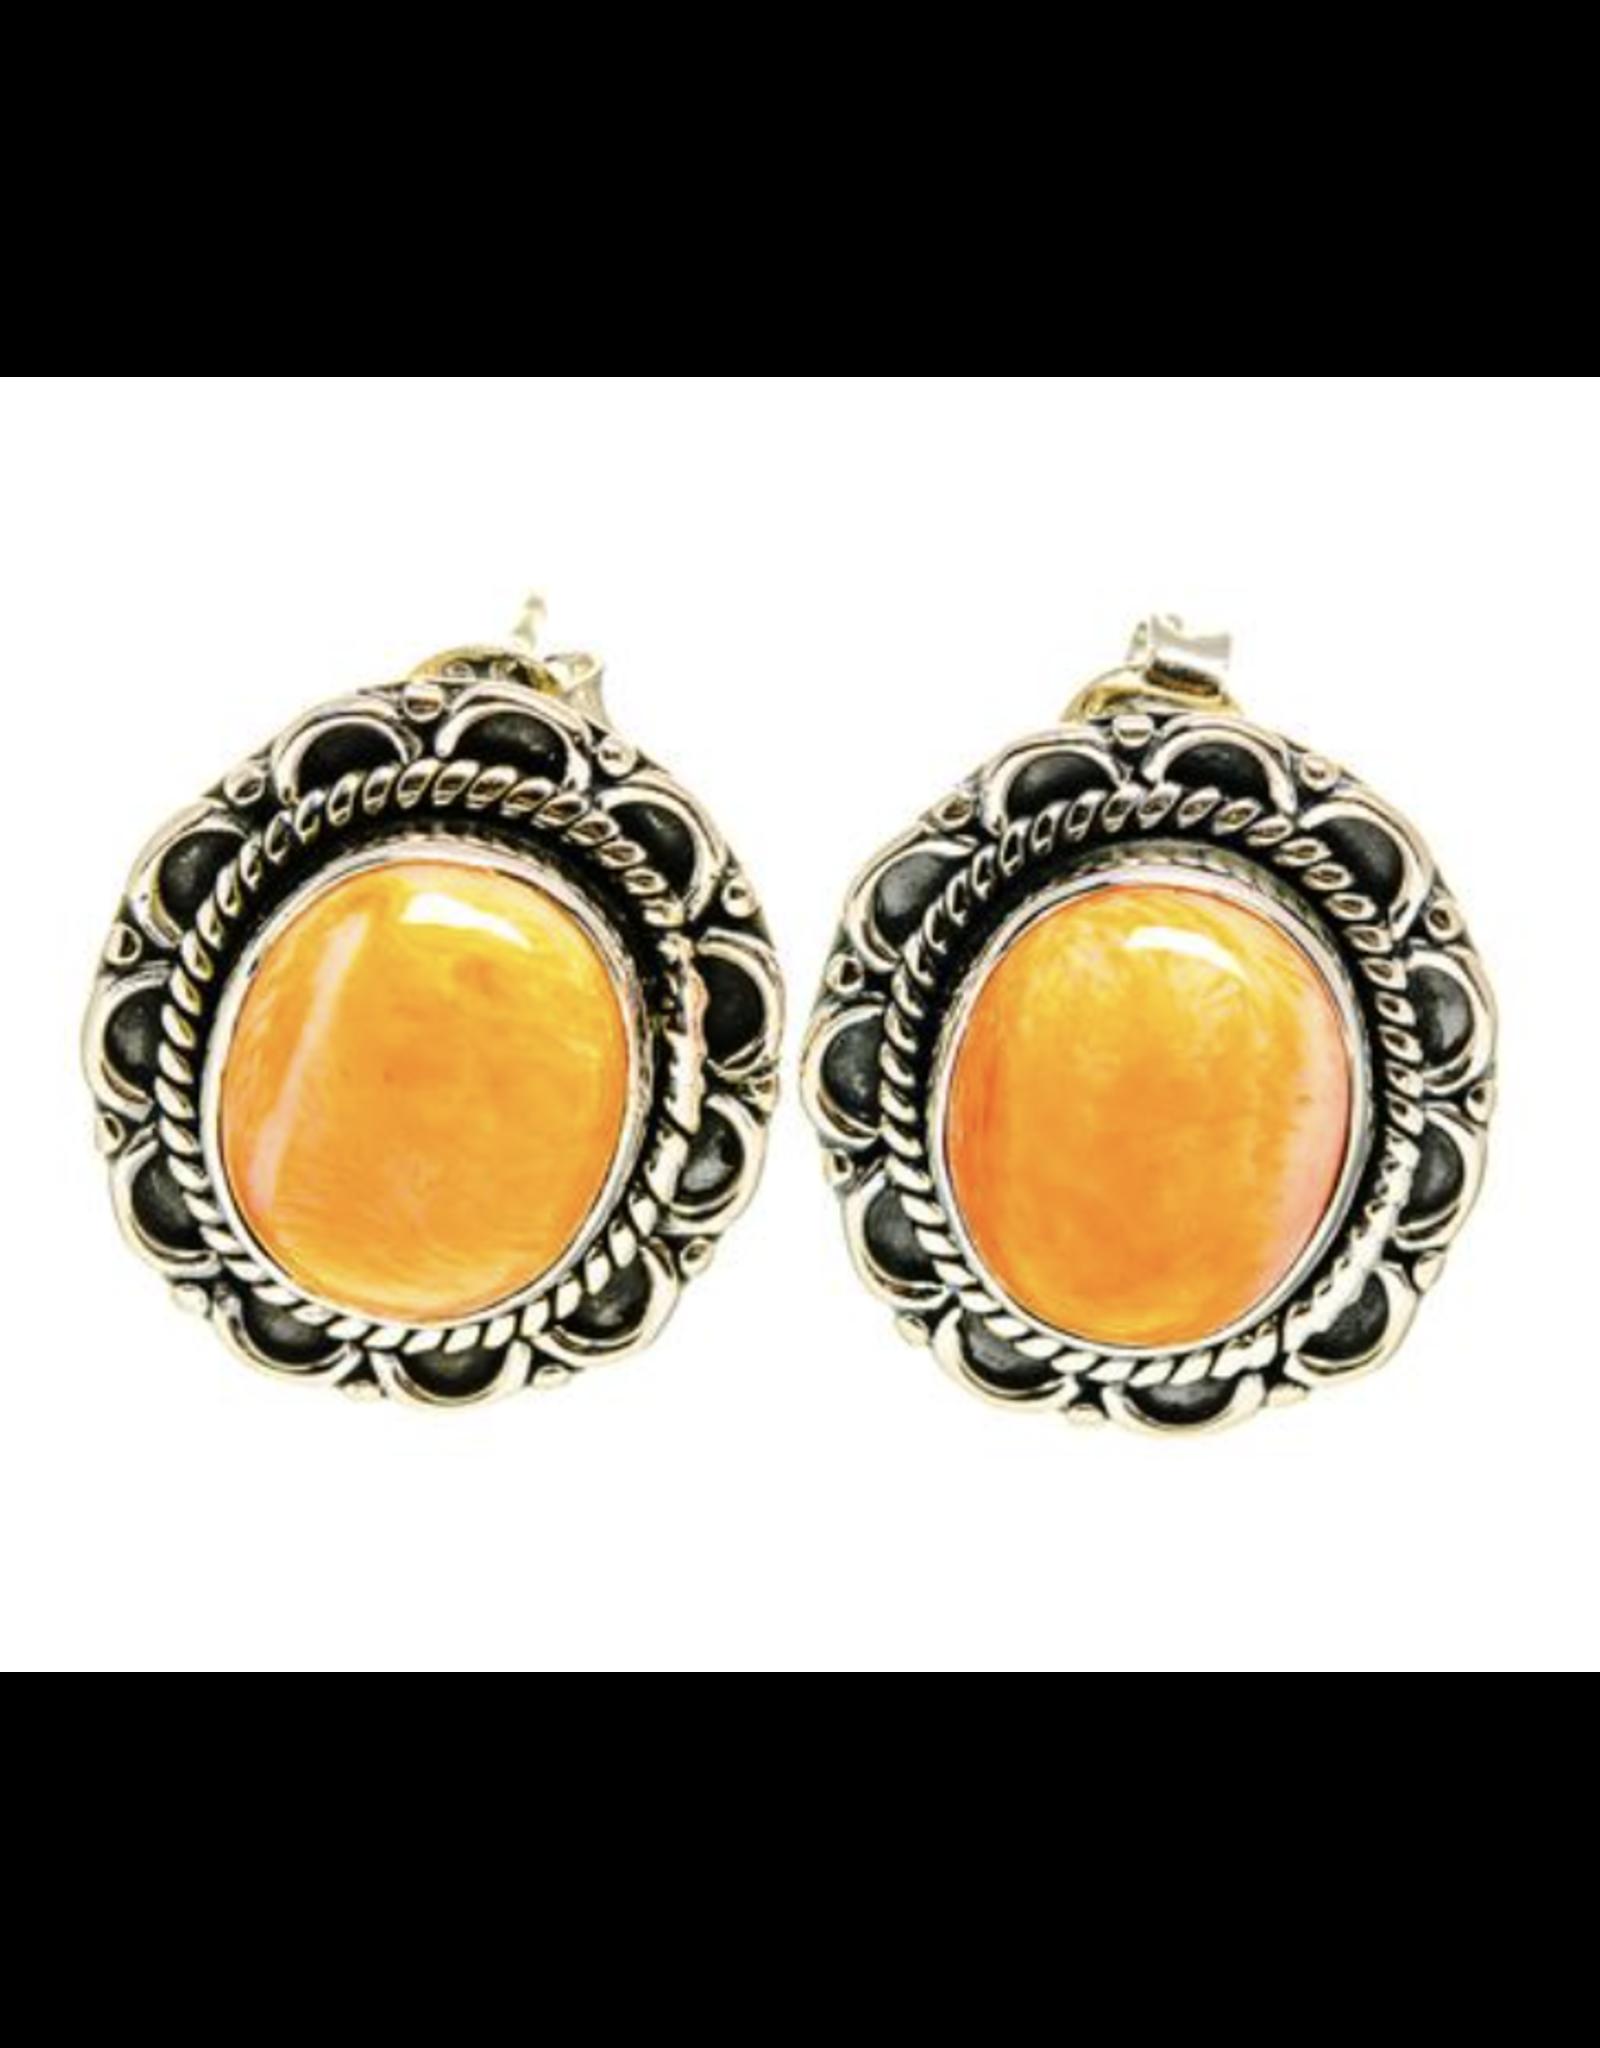 Orange Agate Earrings - Stud